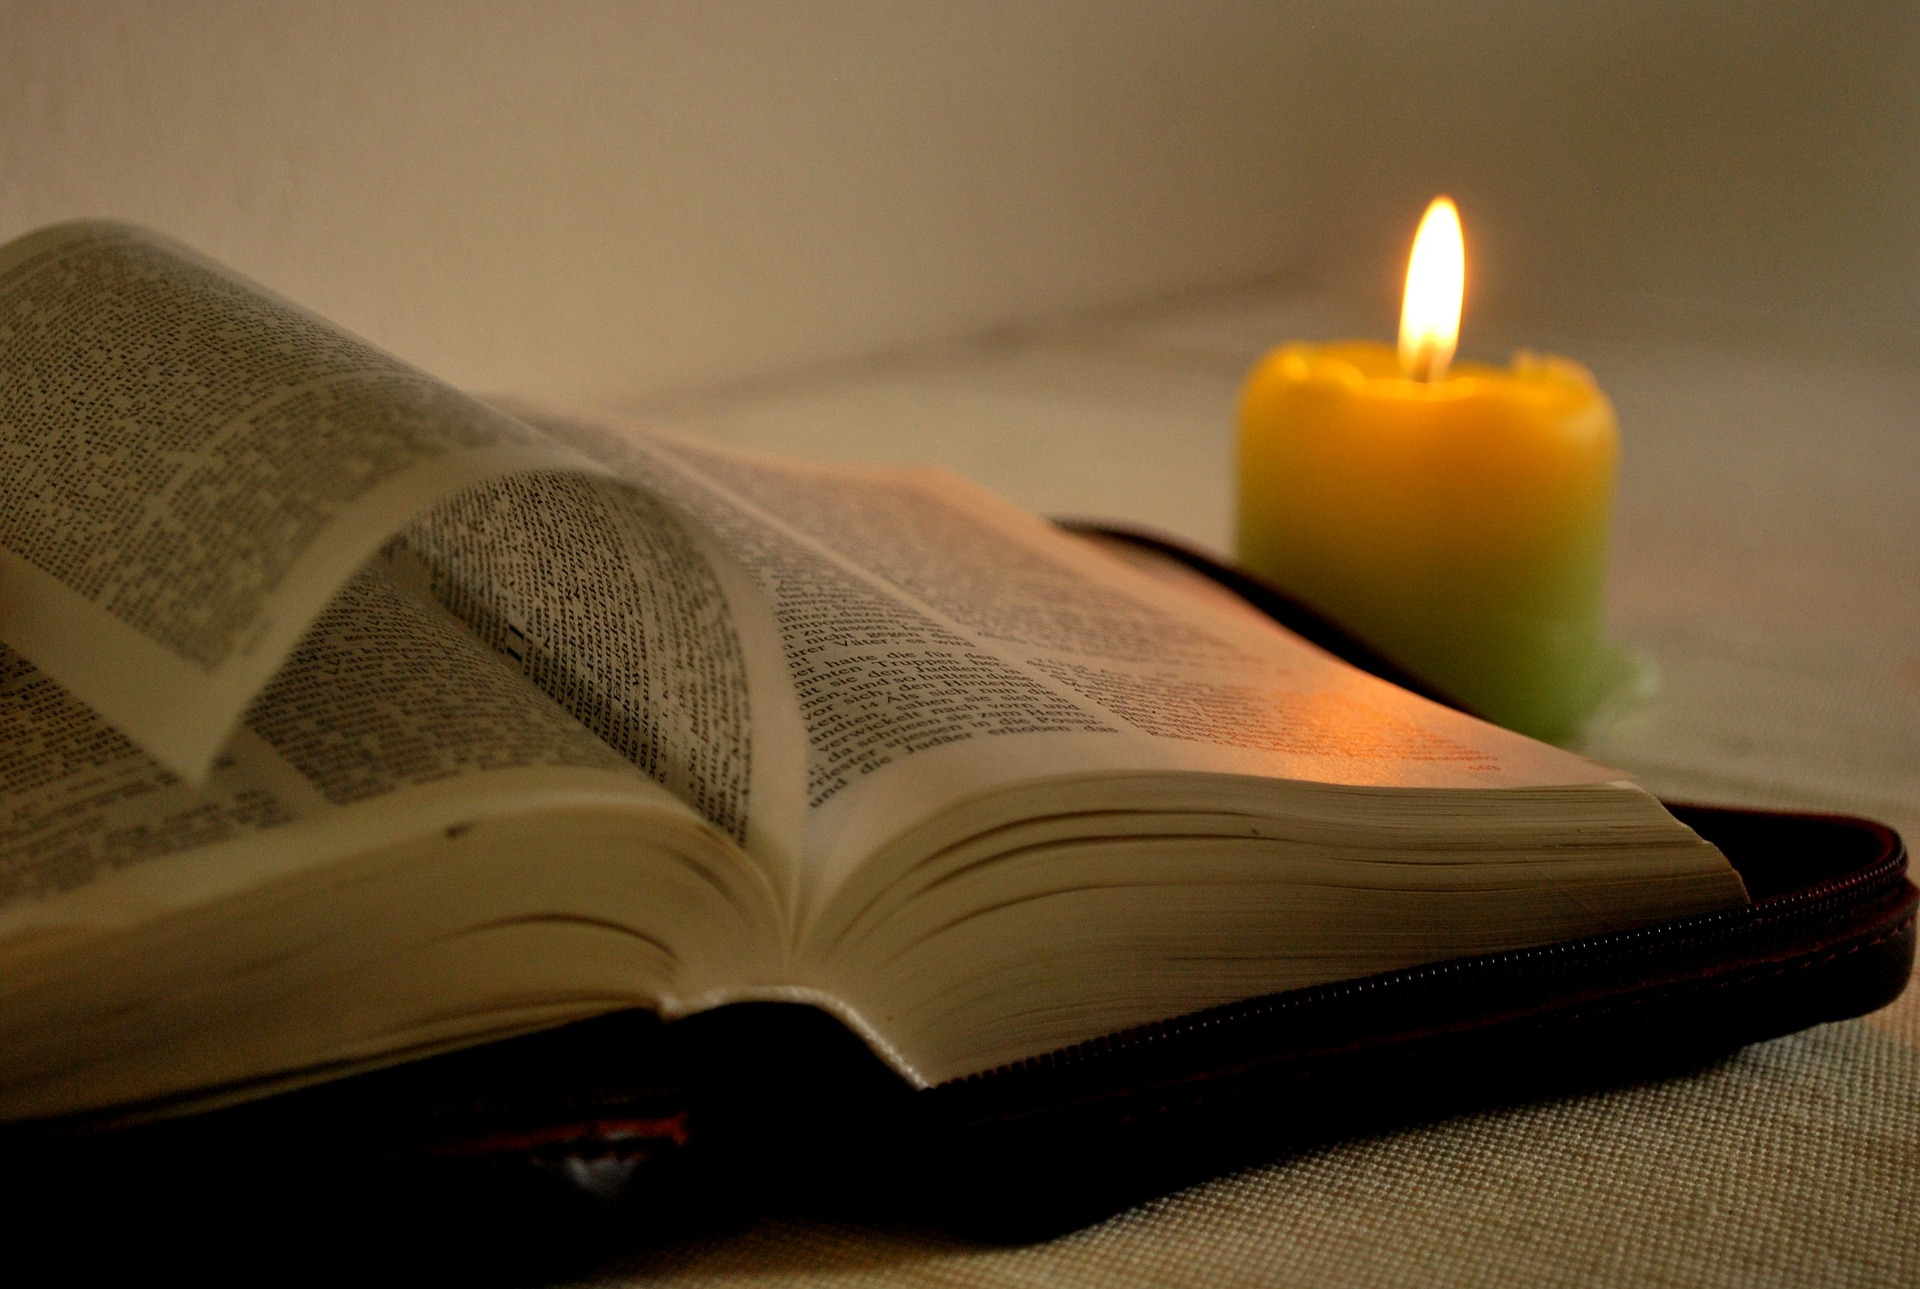 Kerze und Bibel